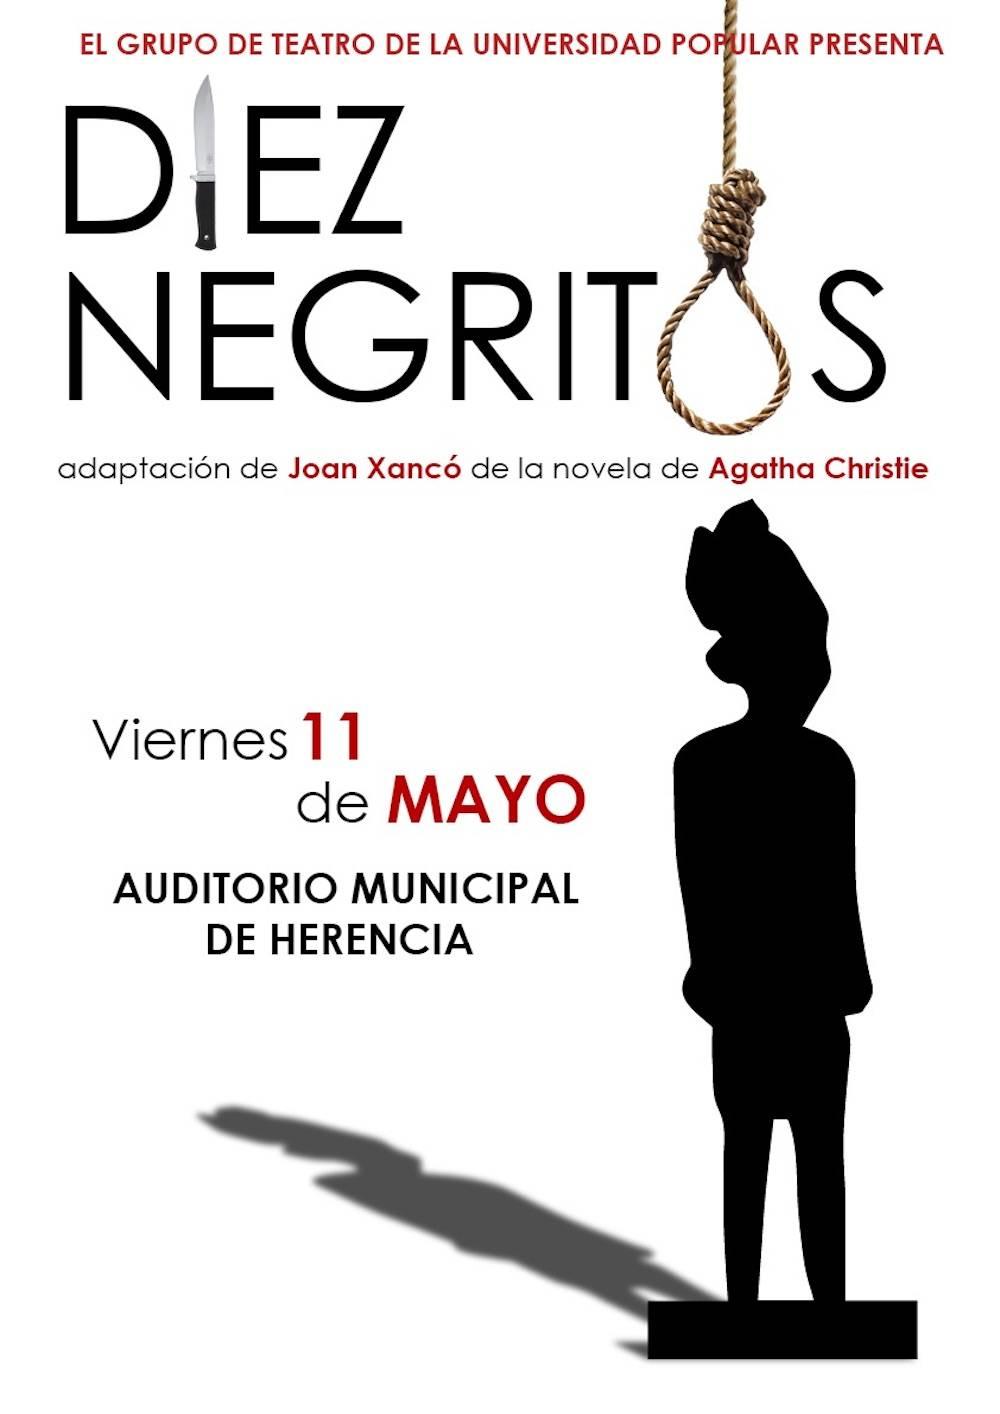 "Diez Negritos teatro herencia - Grupos de Teatro de Herencia presenta la obra ""Diez Negritos"""